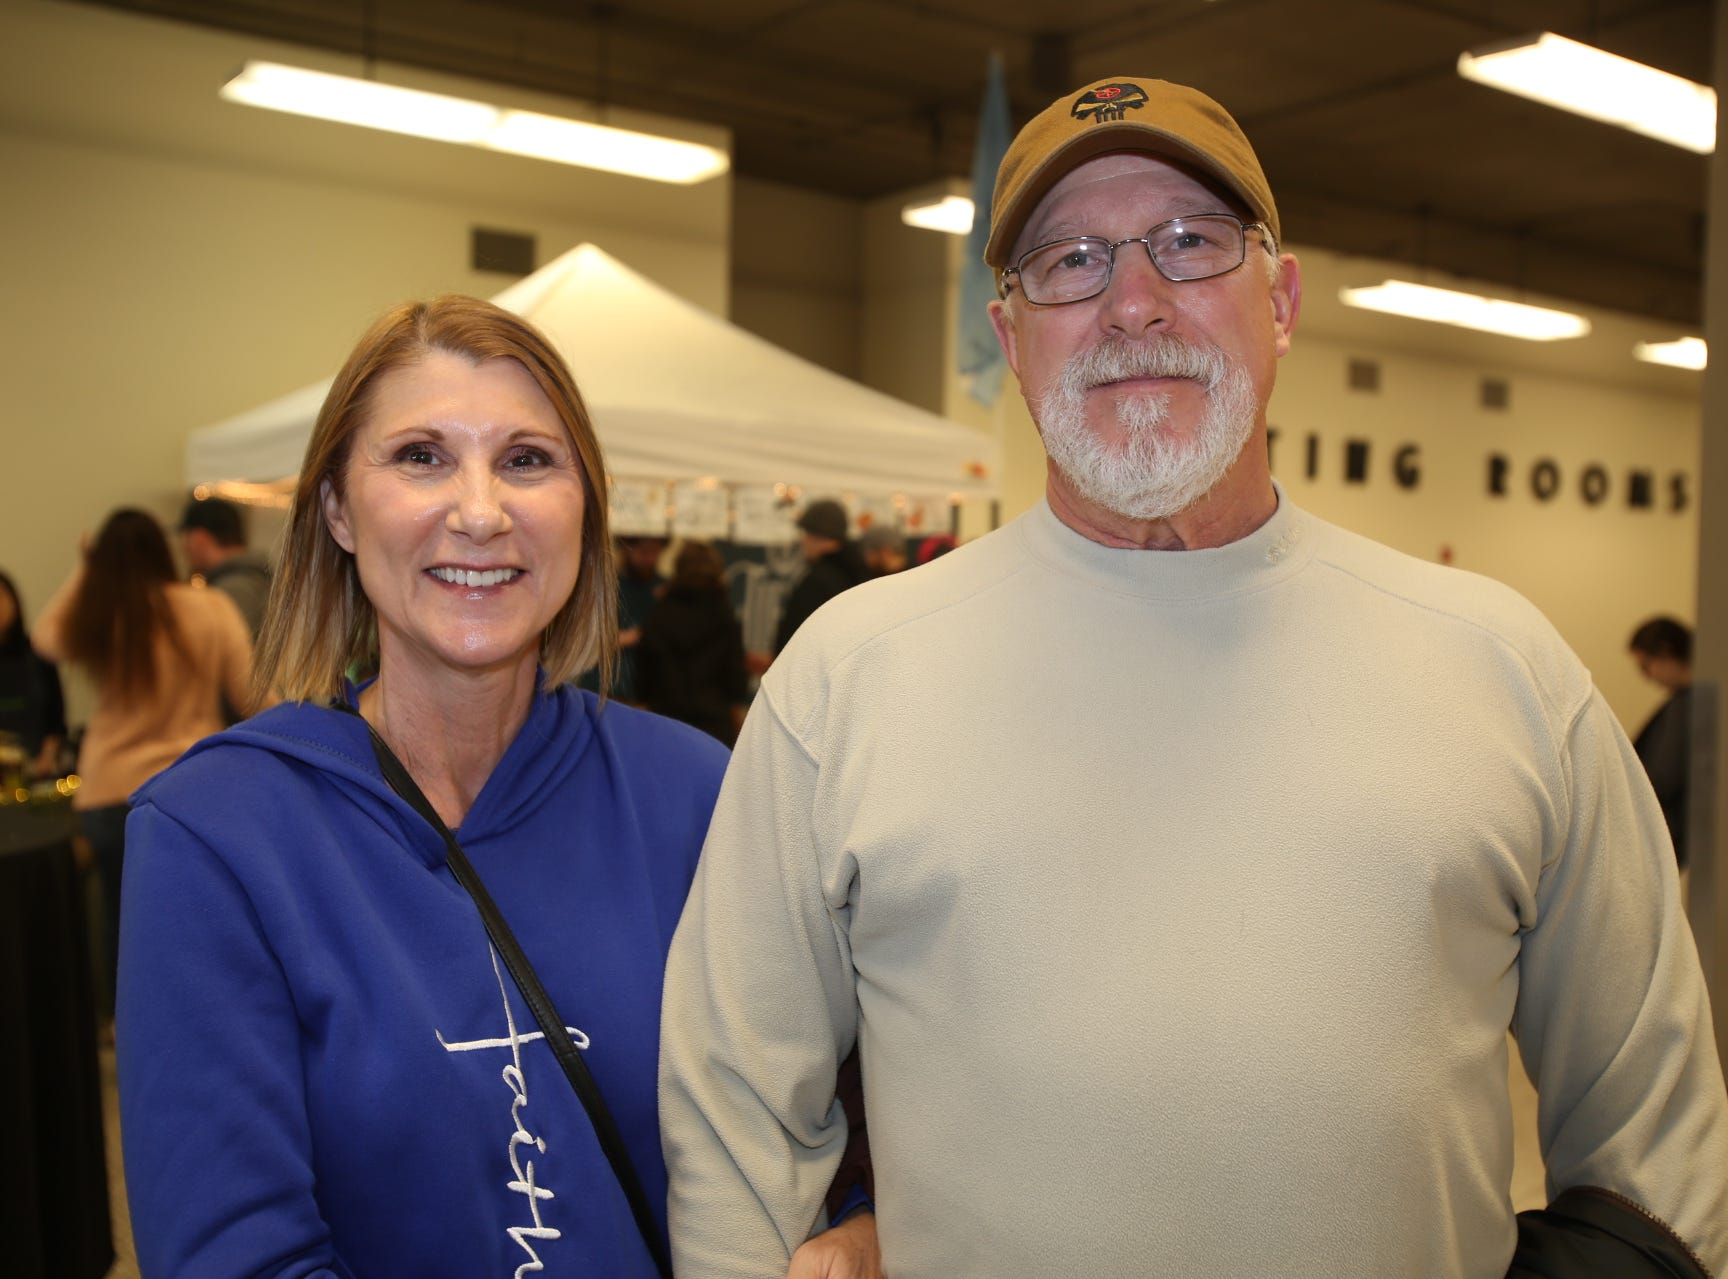 Cathy and Randy Pearman